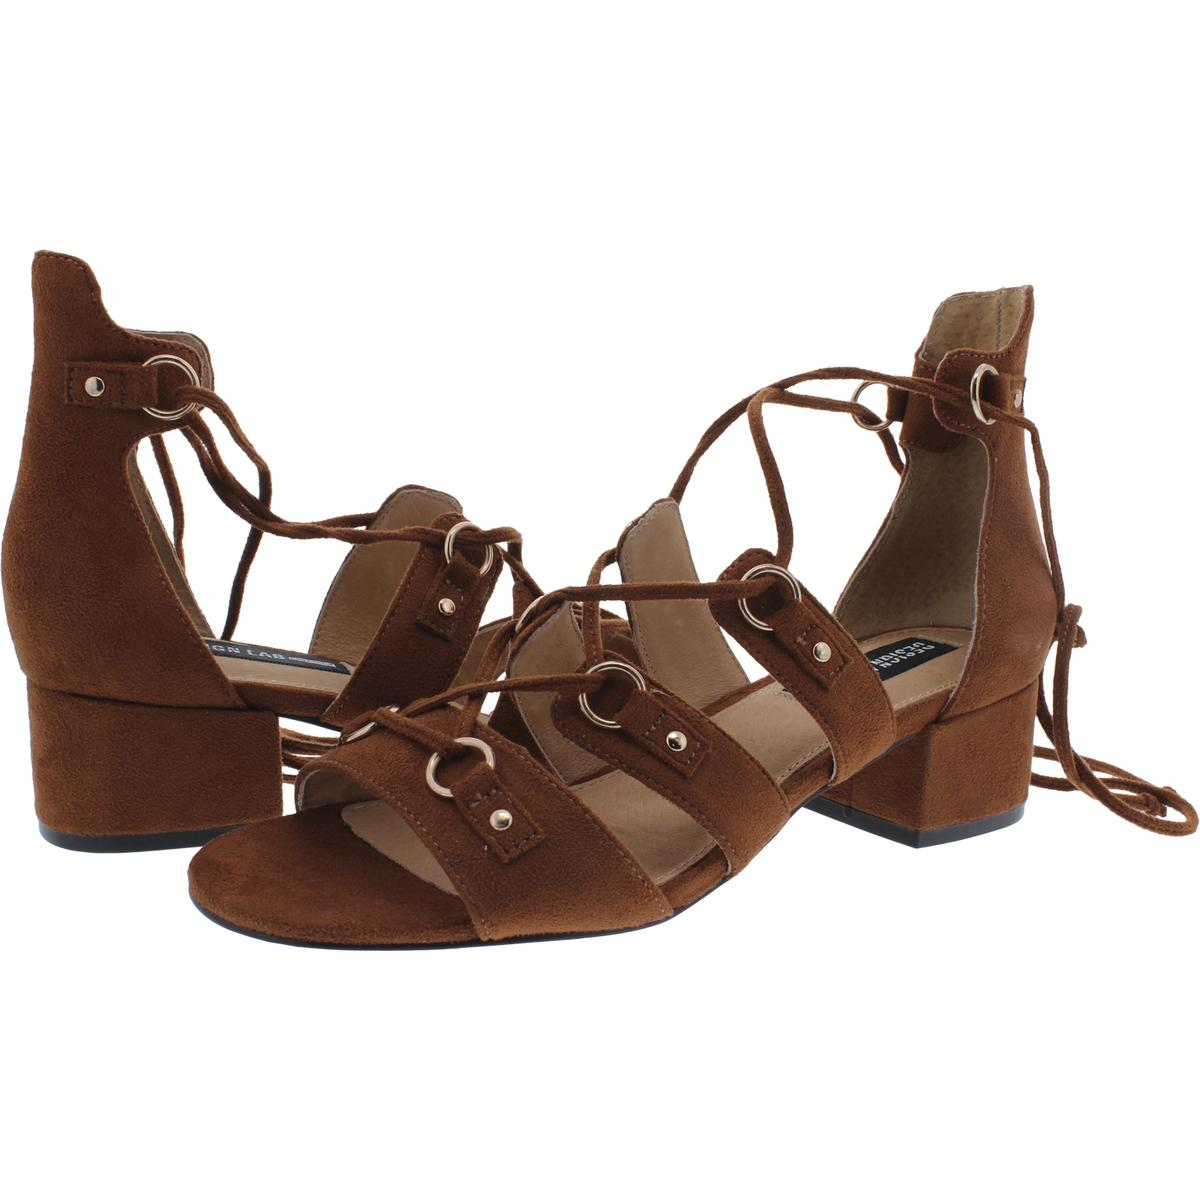 Design-Lab-Womens-Eldy-Block-Heel-Dress-Sandals-Shoes-BHFO-2676 thumbnail 9